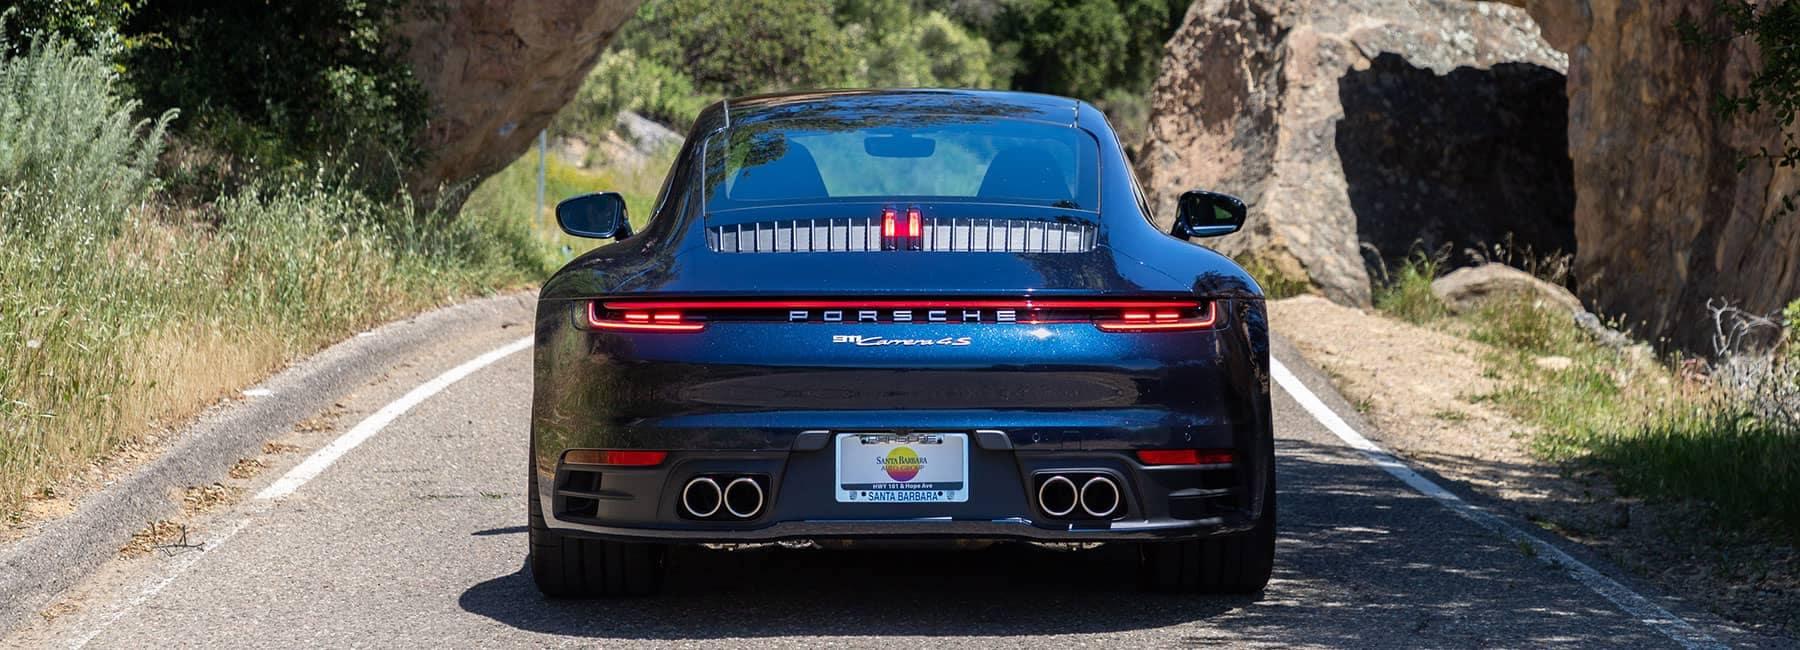 New_2020-Porsche-911-Carrera-4S-8